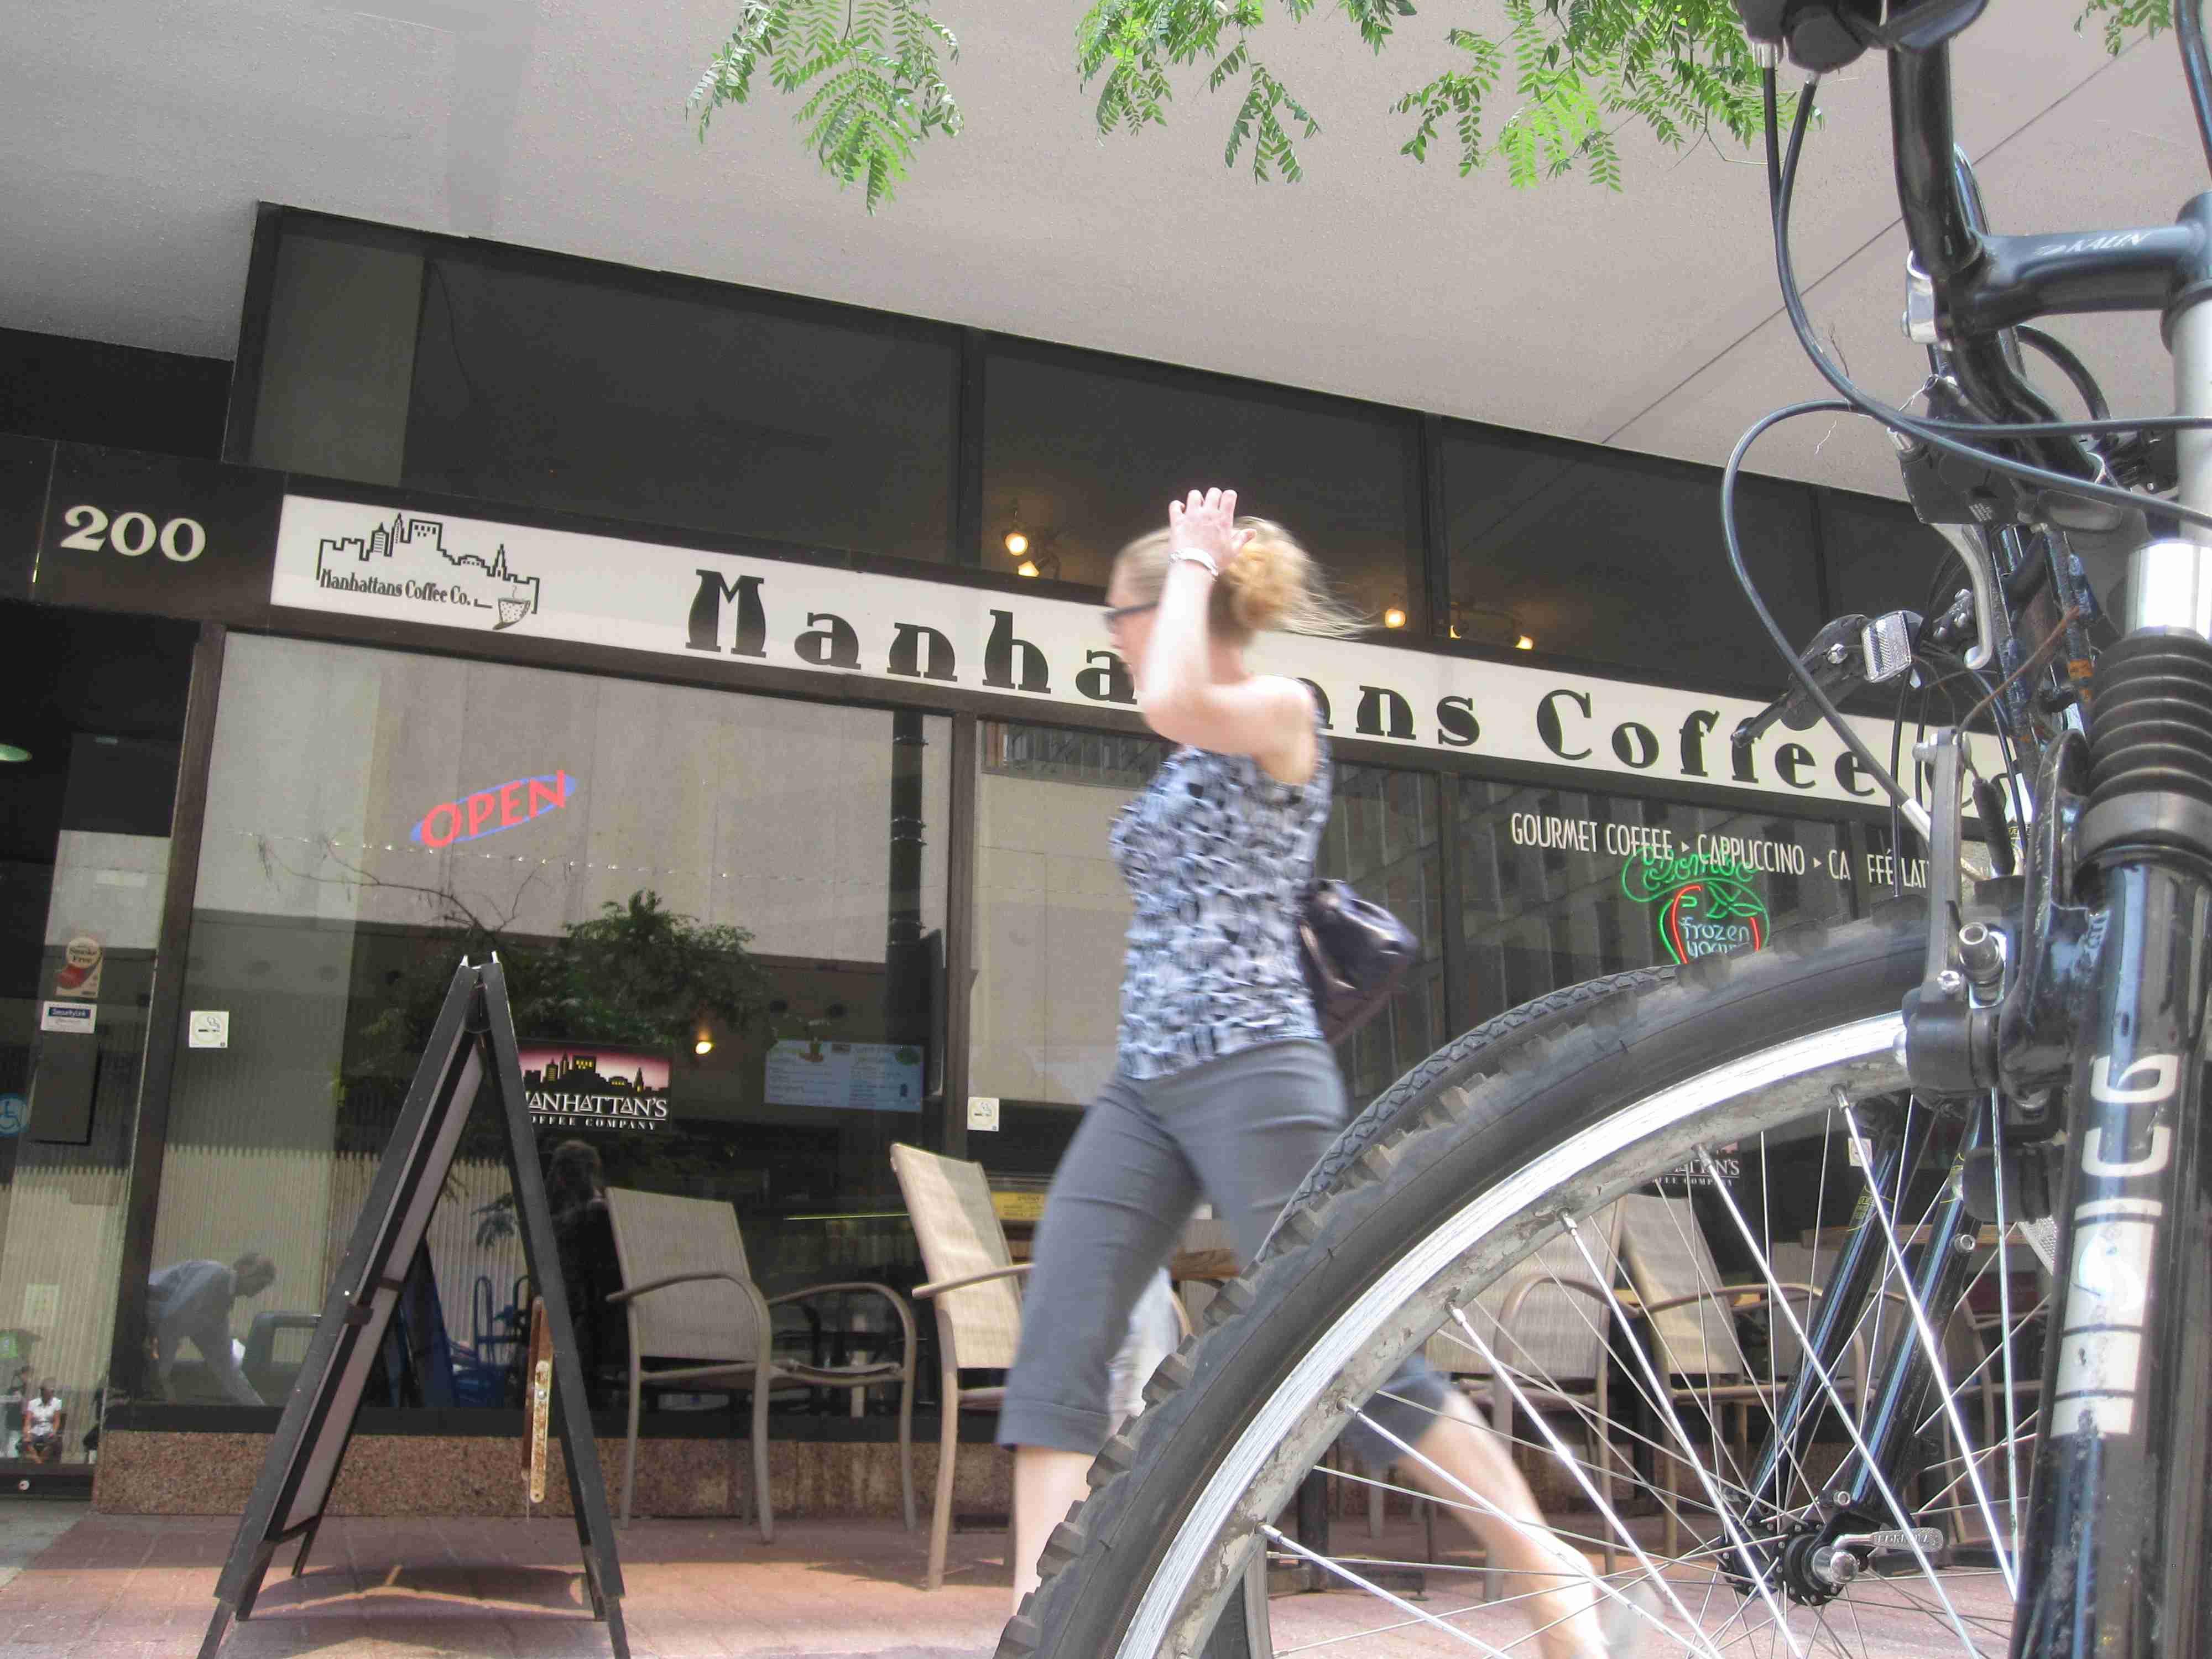 Ottawa Bicycle Culture – 200 Manhattans